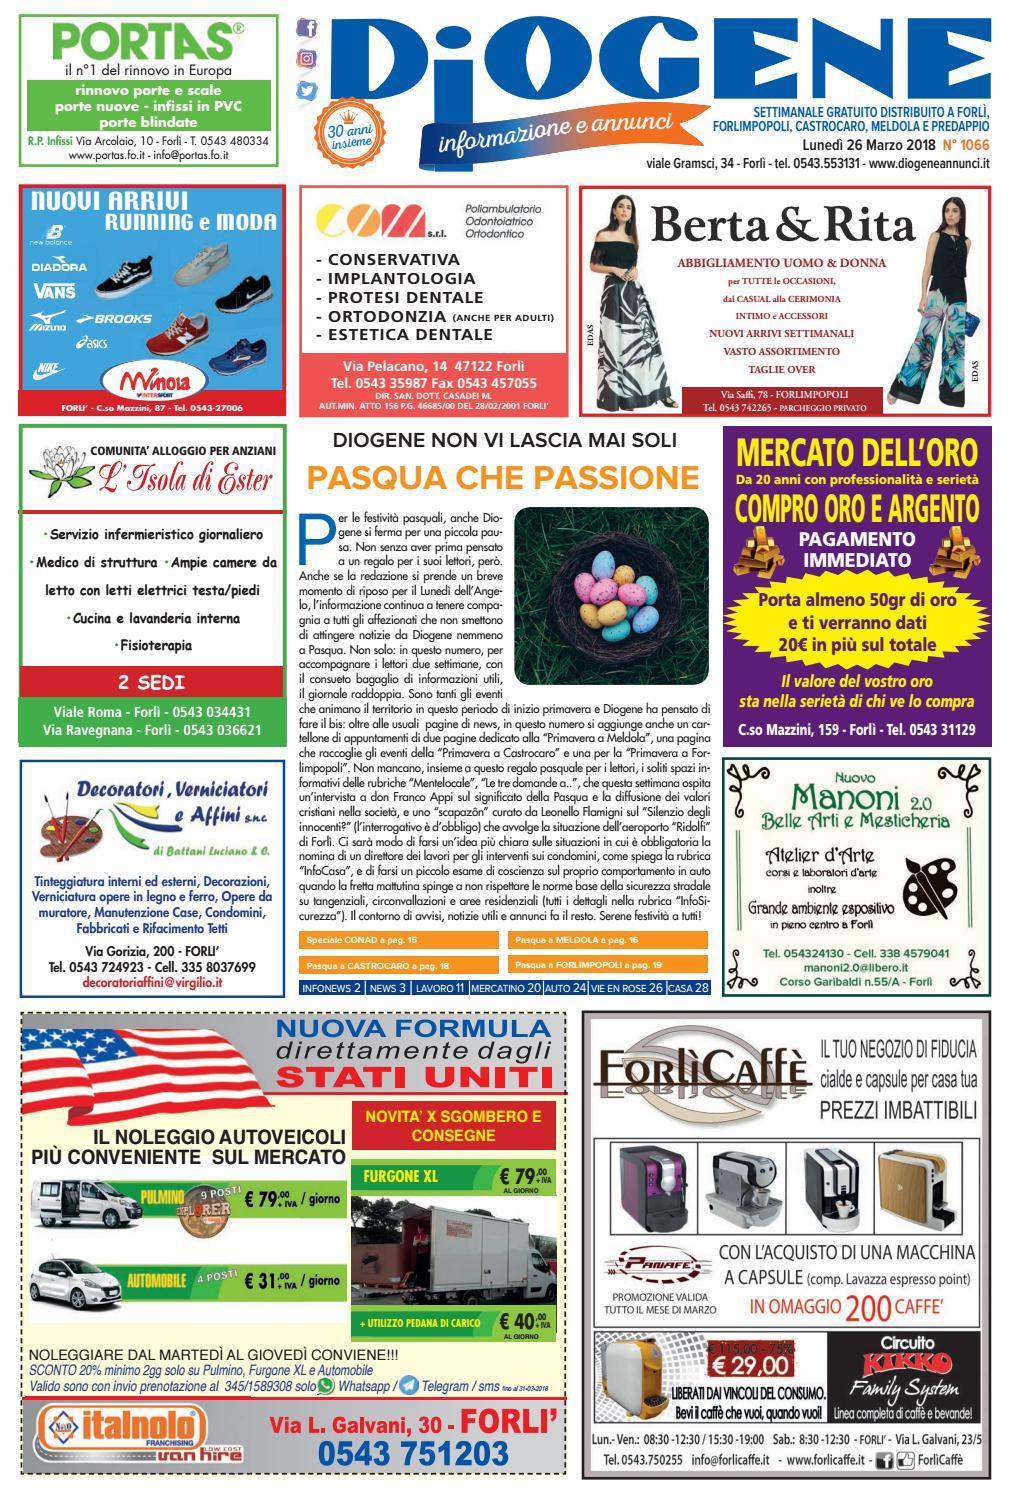 siti di incontri di Pune gratis